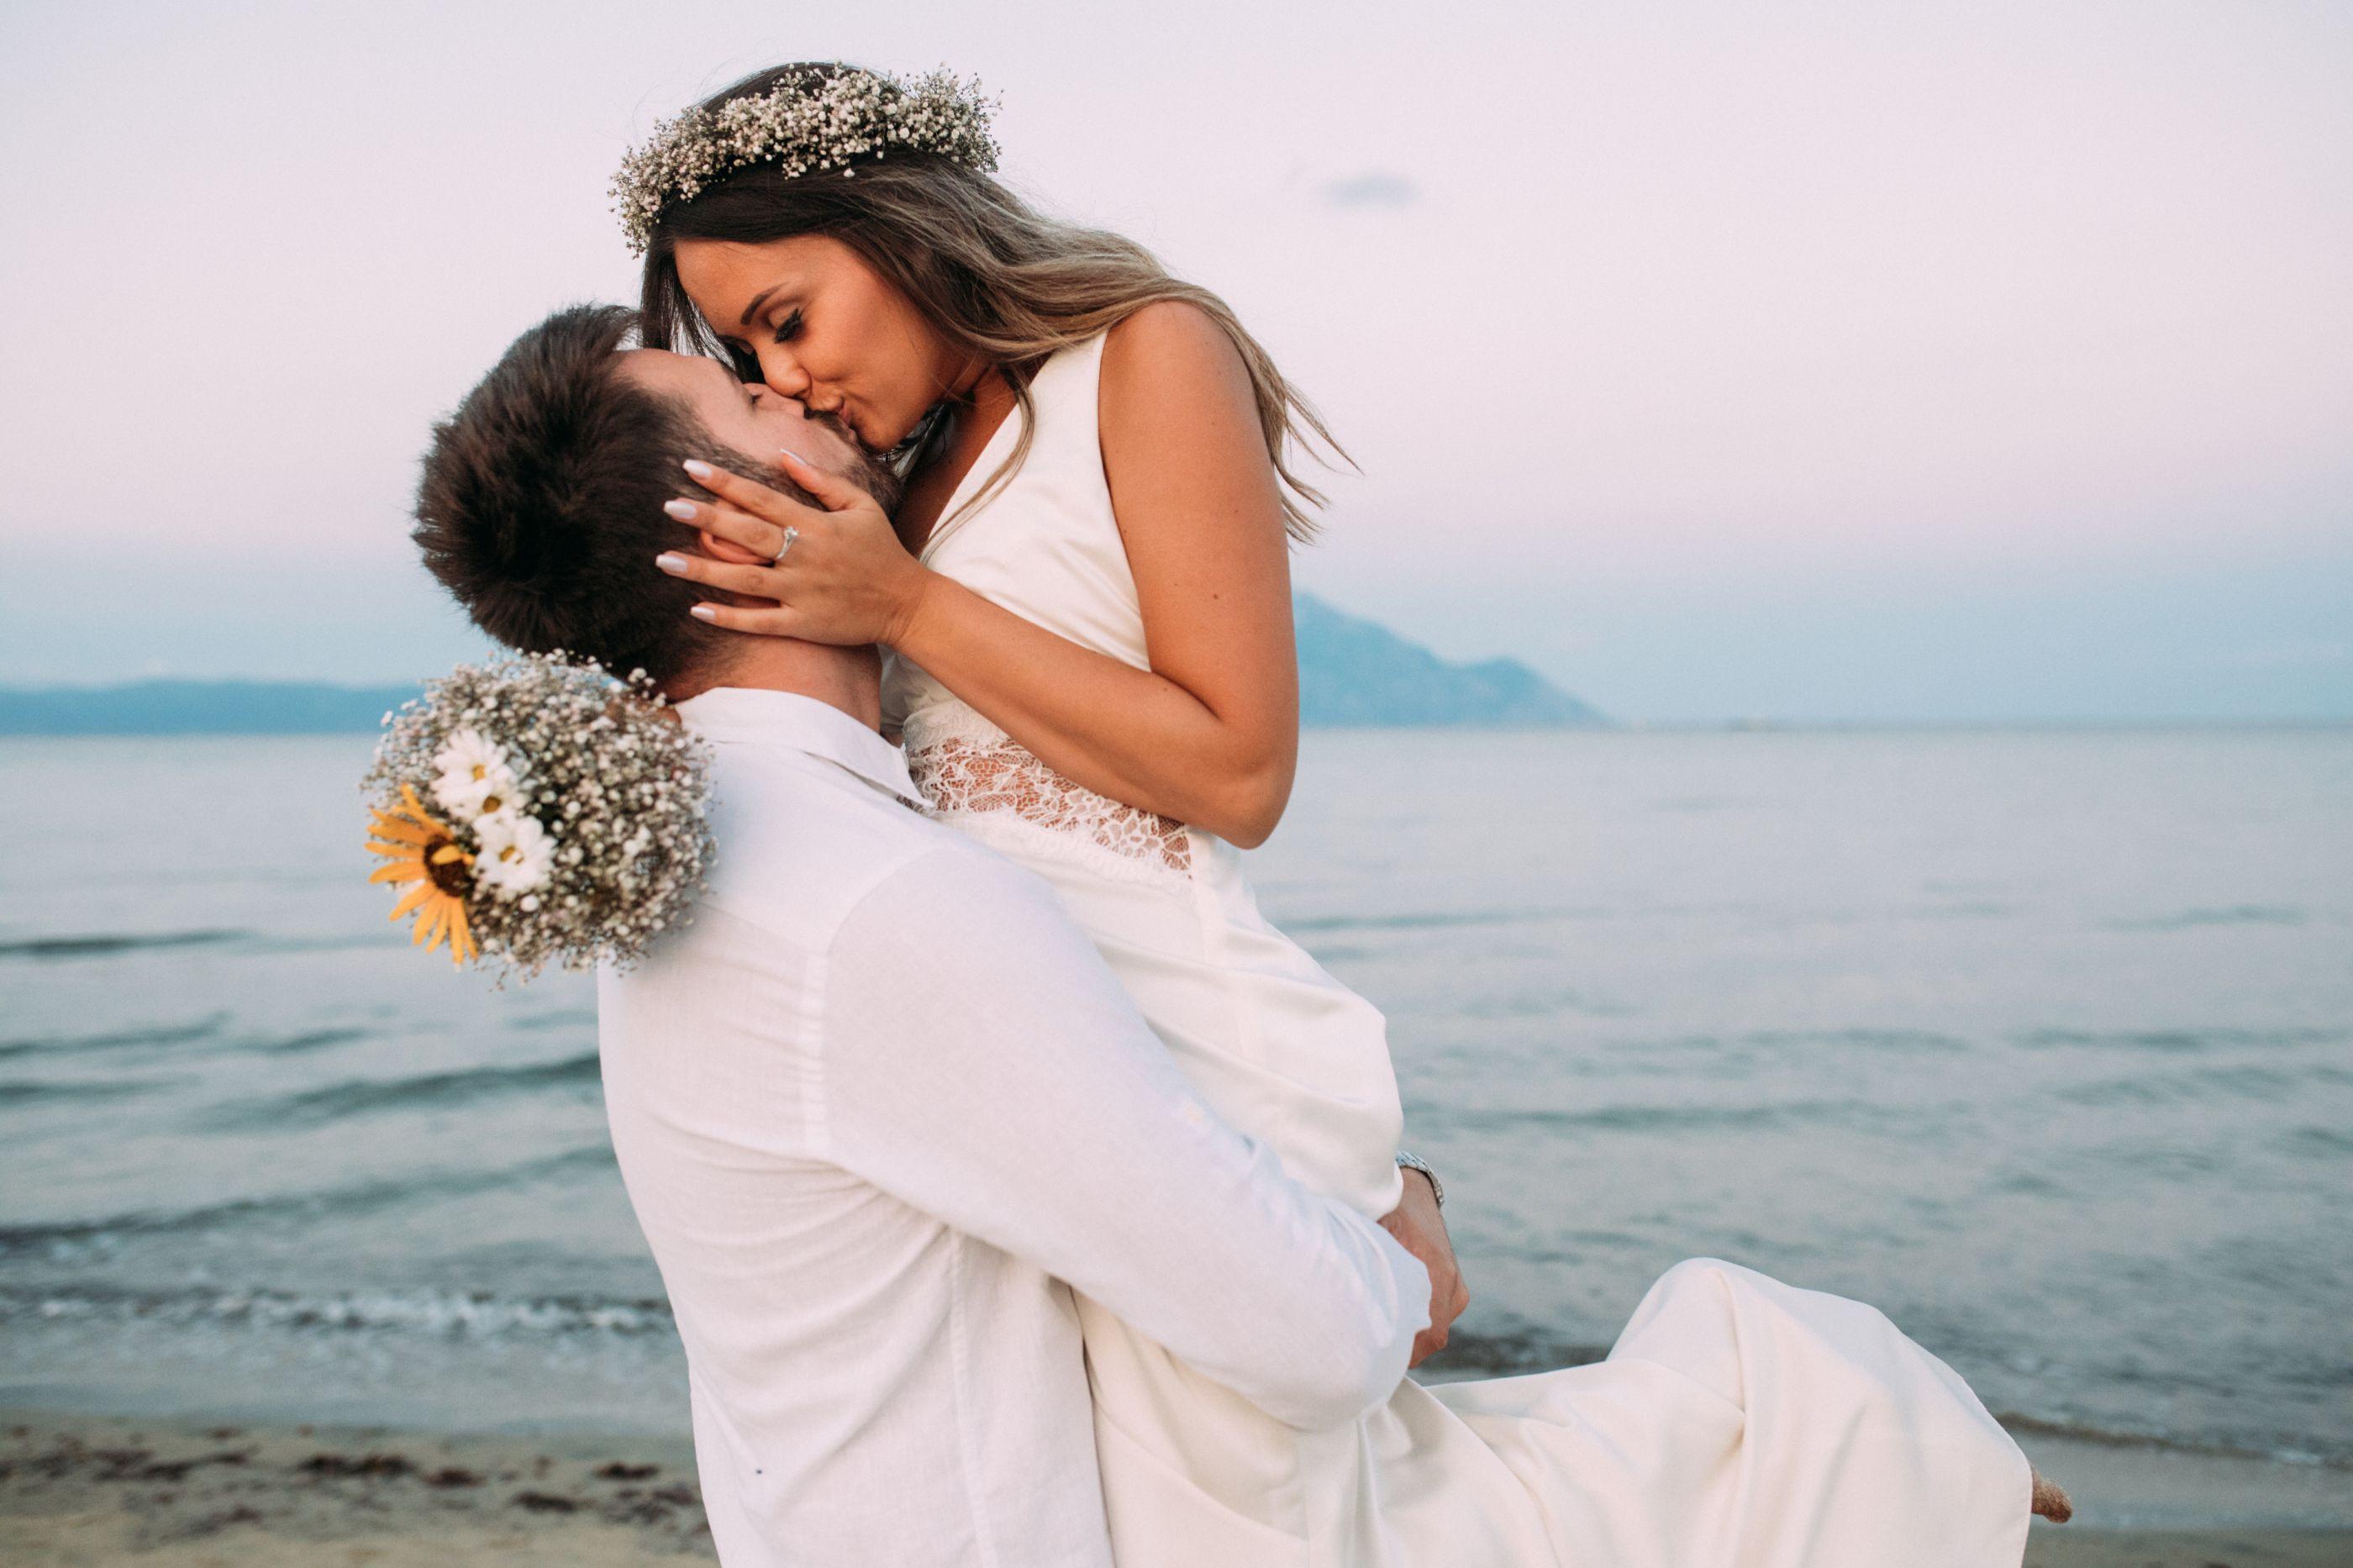 Teoria do compromisso: Casados após um ano ou constante fase de namoro?